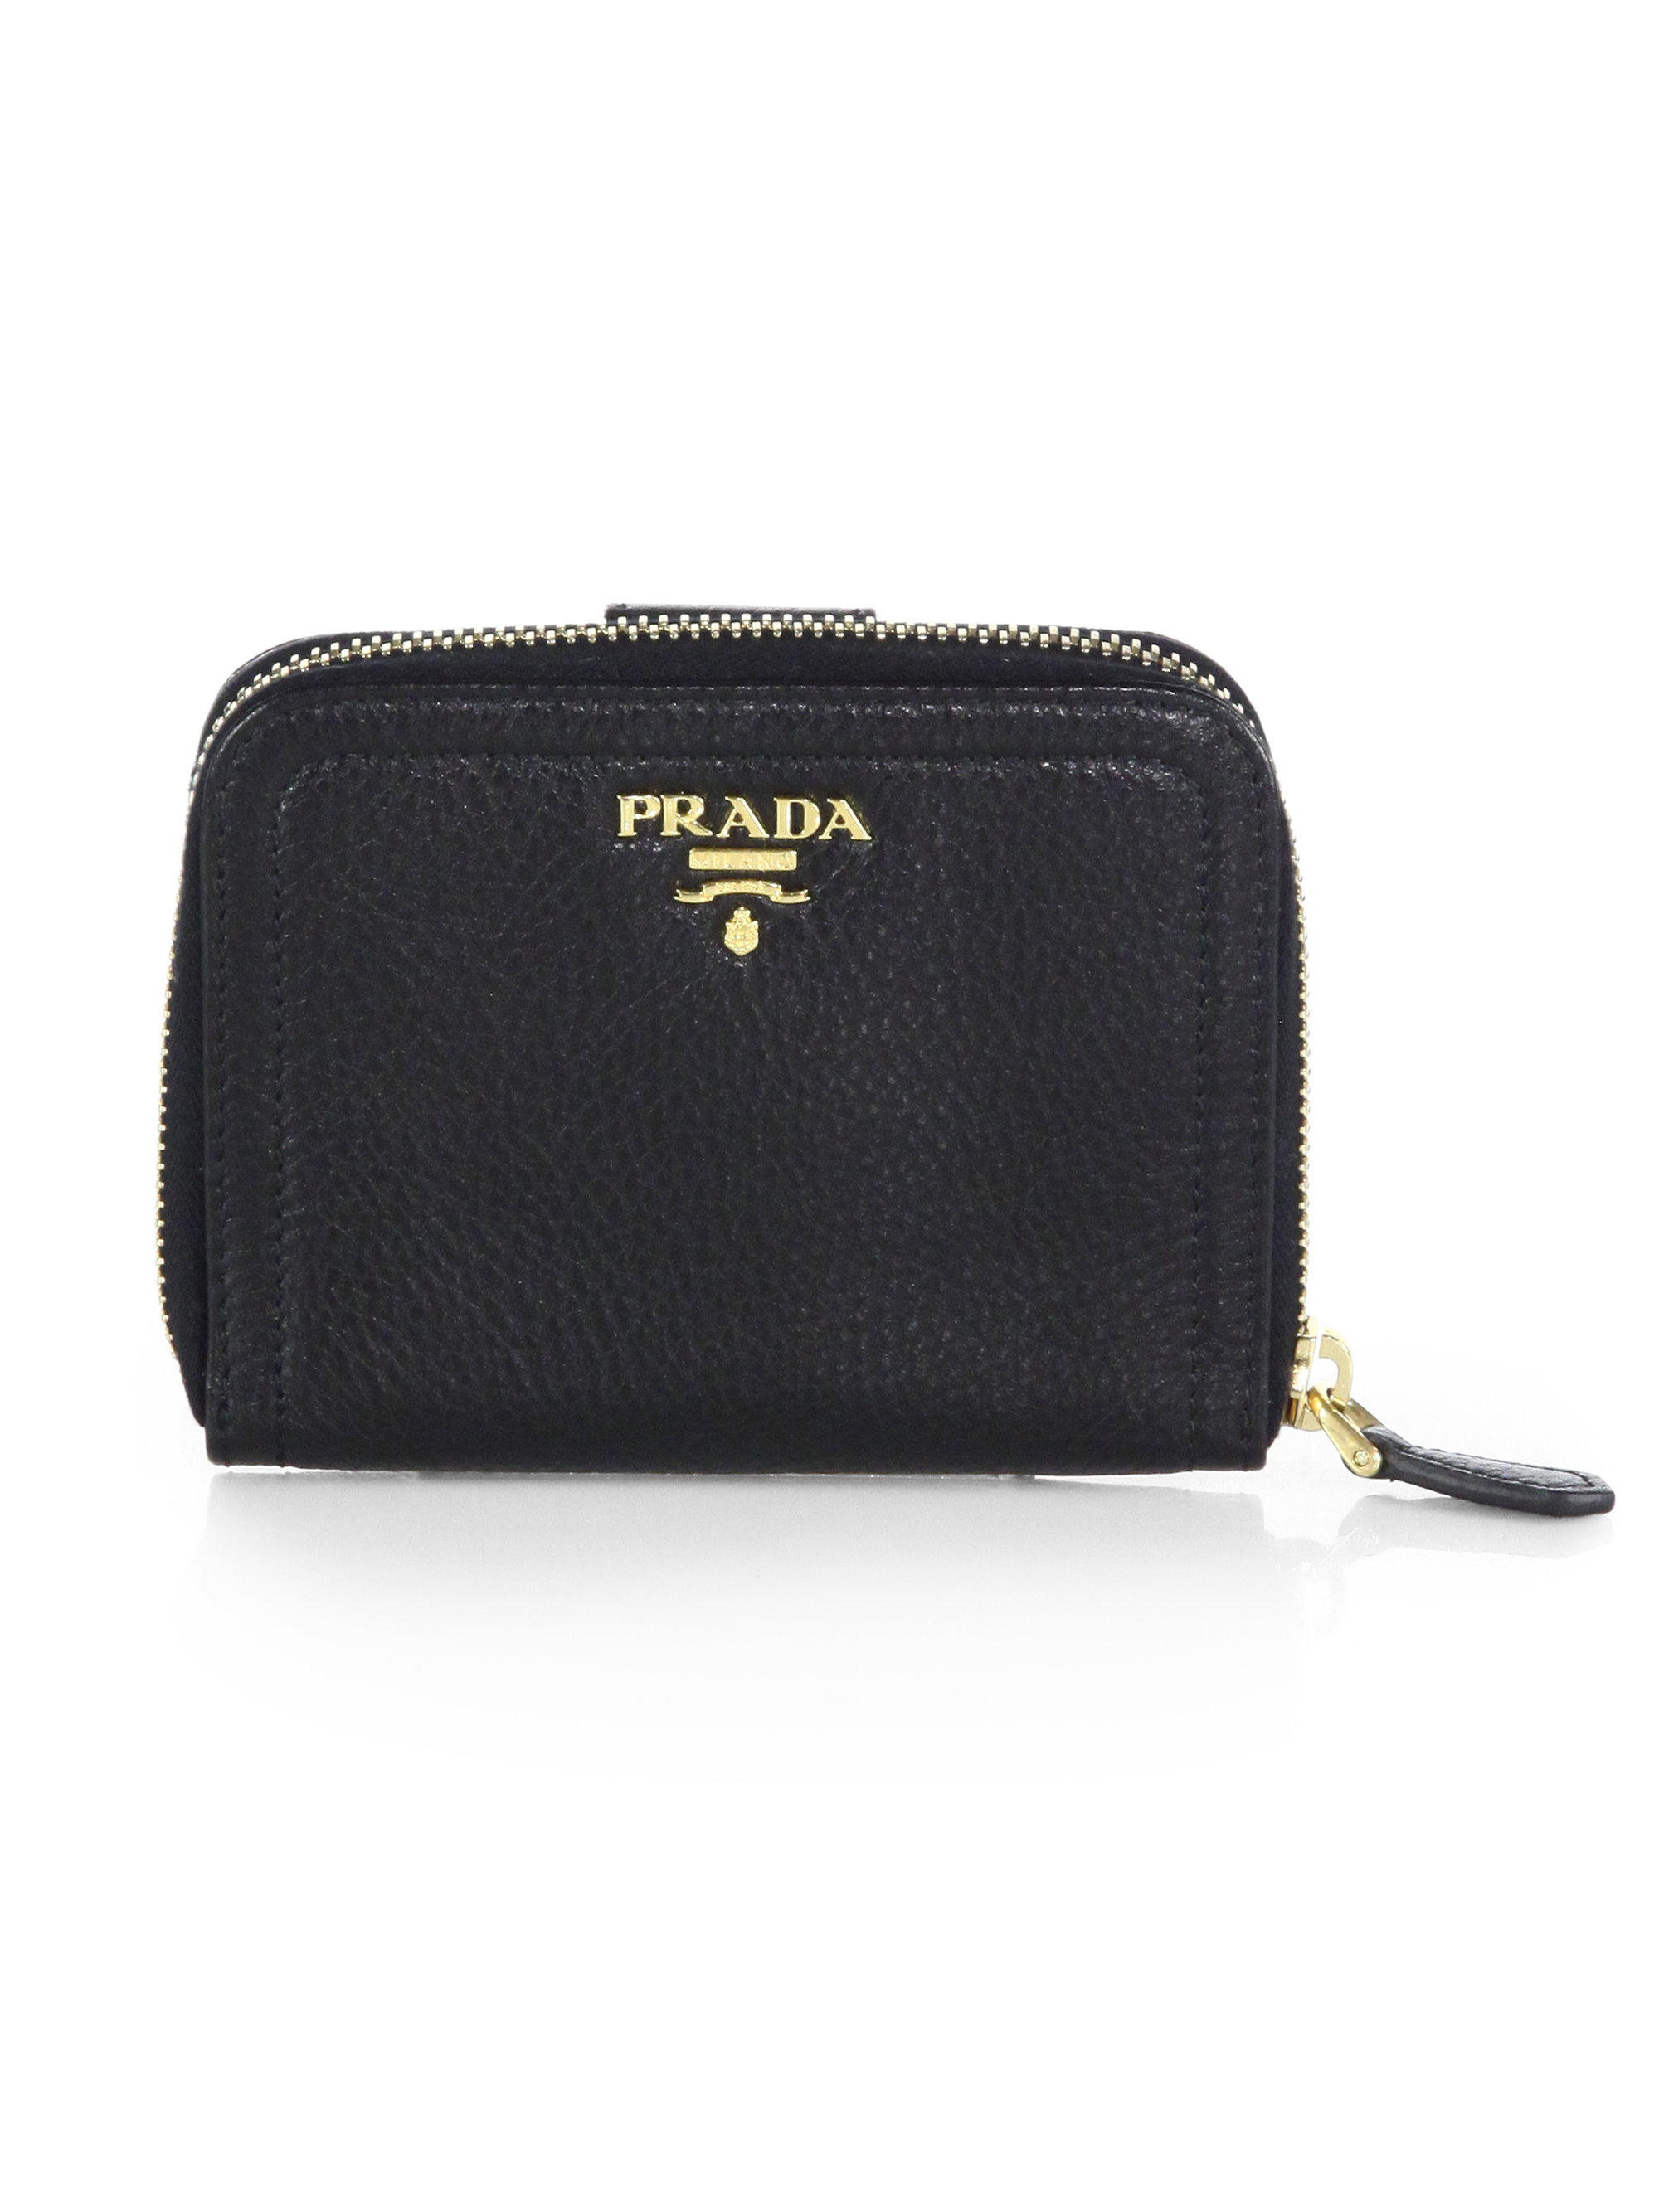 Prada Daino Small Zip Around Leather Wallet in Black | Lyst